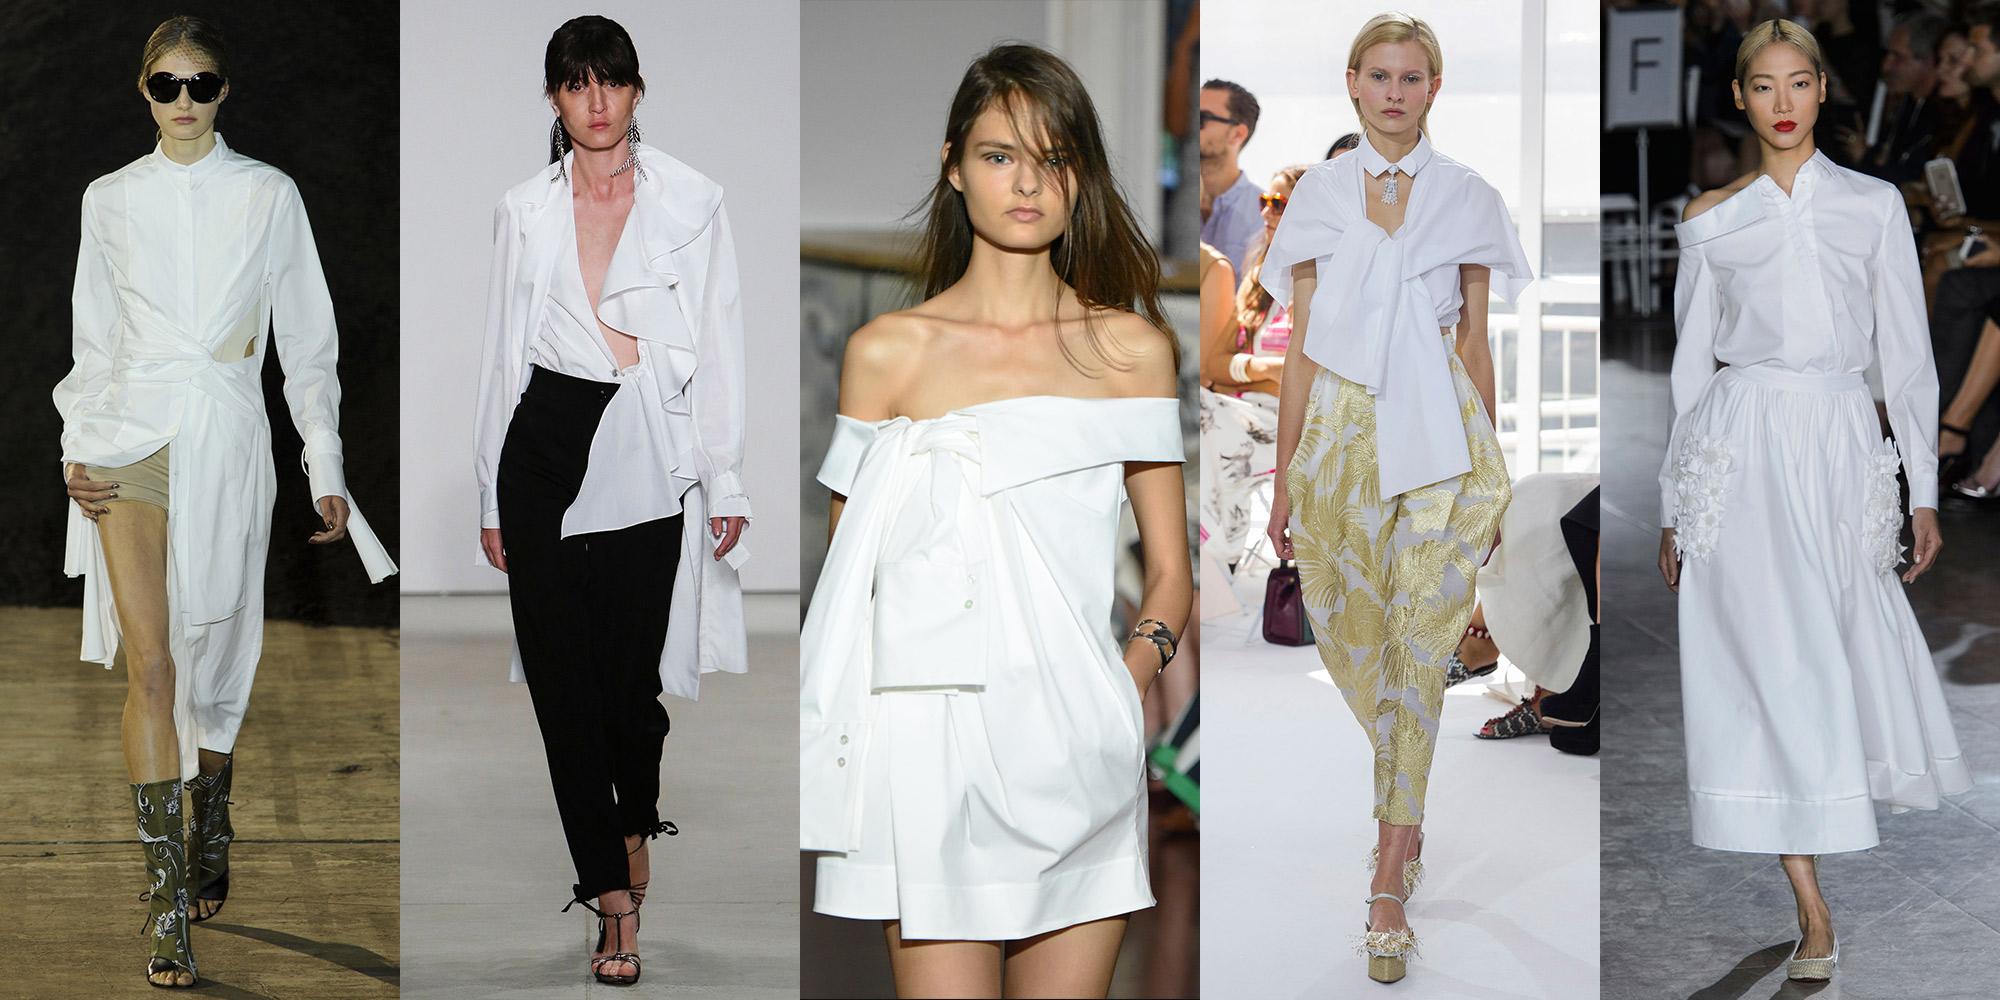 Spring 2017 Beauty Trend Report How To Wear Glitter: White-1.jpg